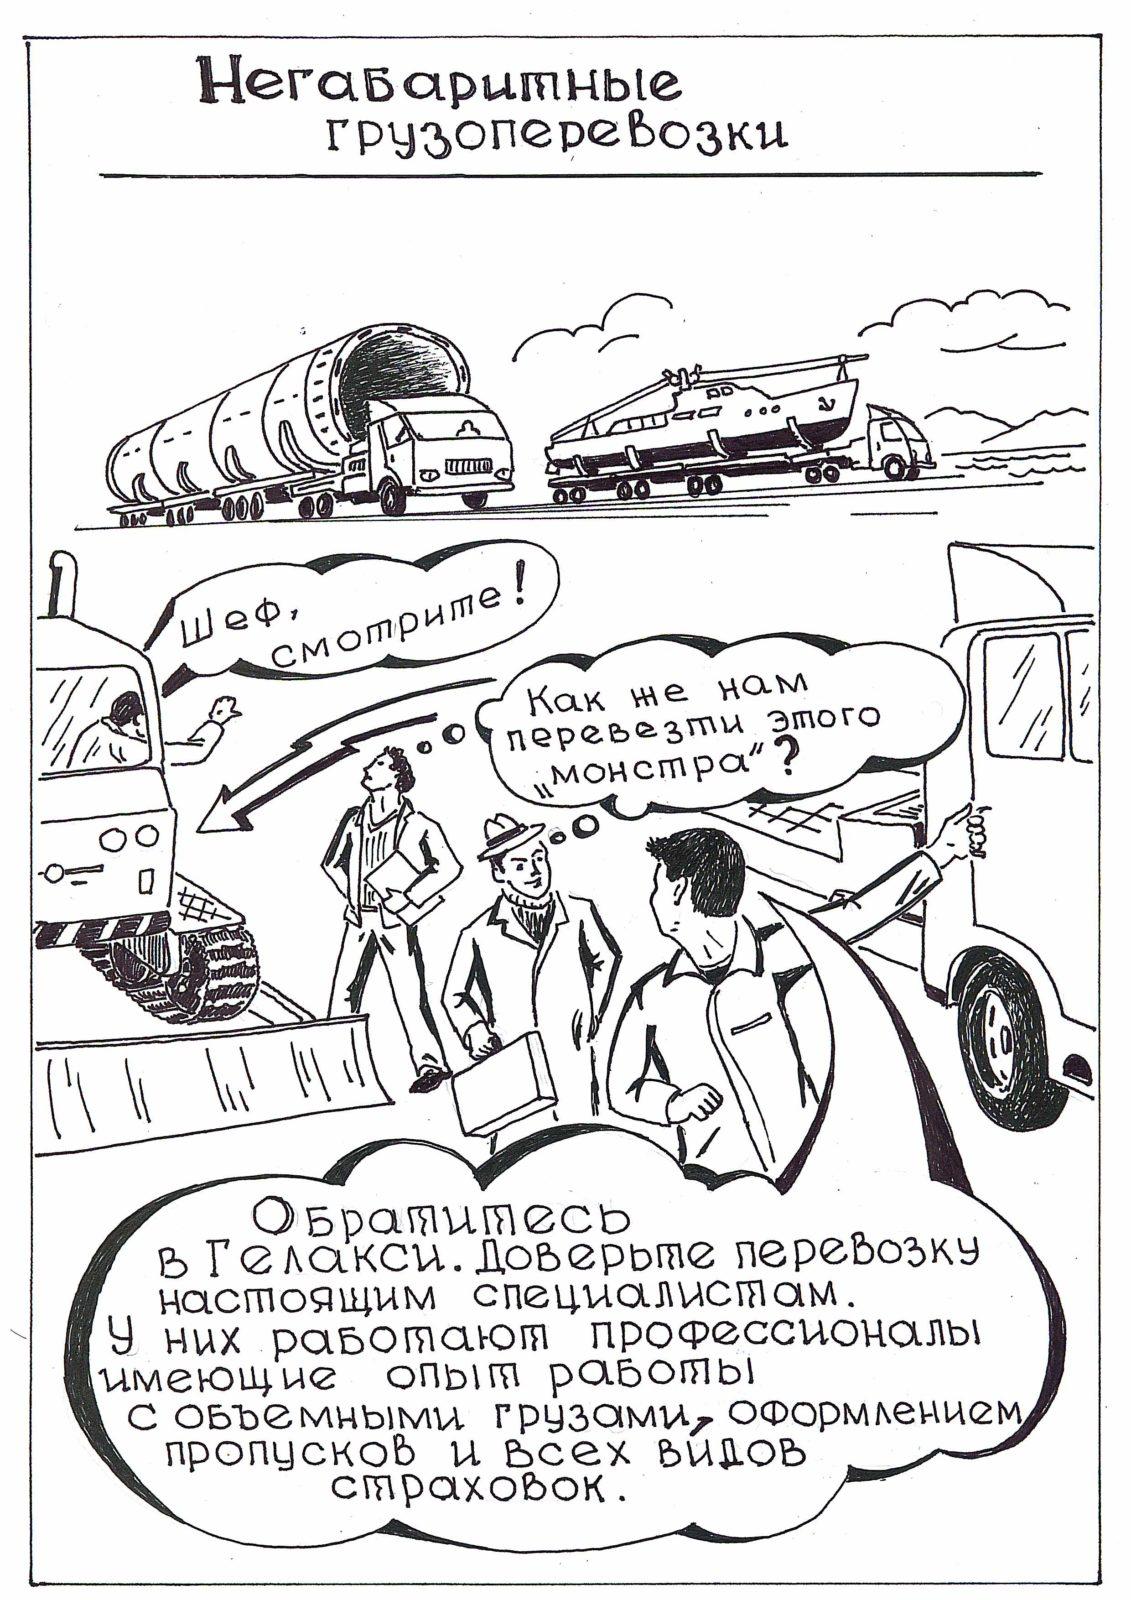 Перевозка крупнотоннажных грузов